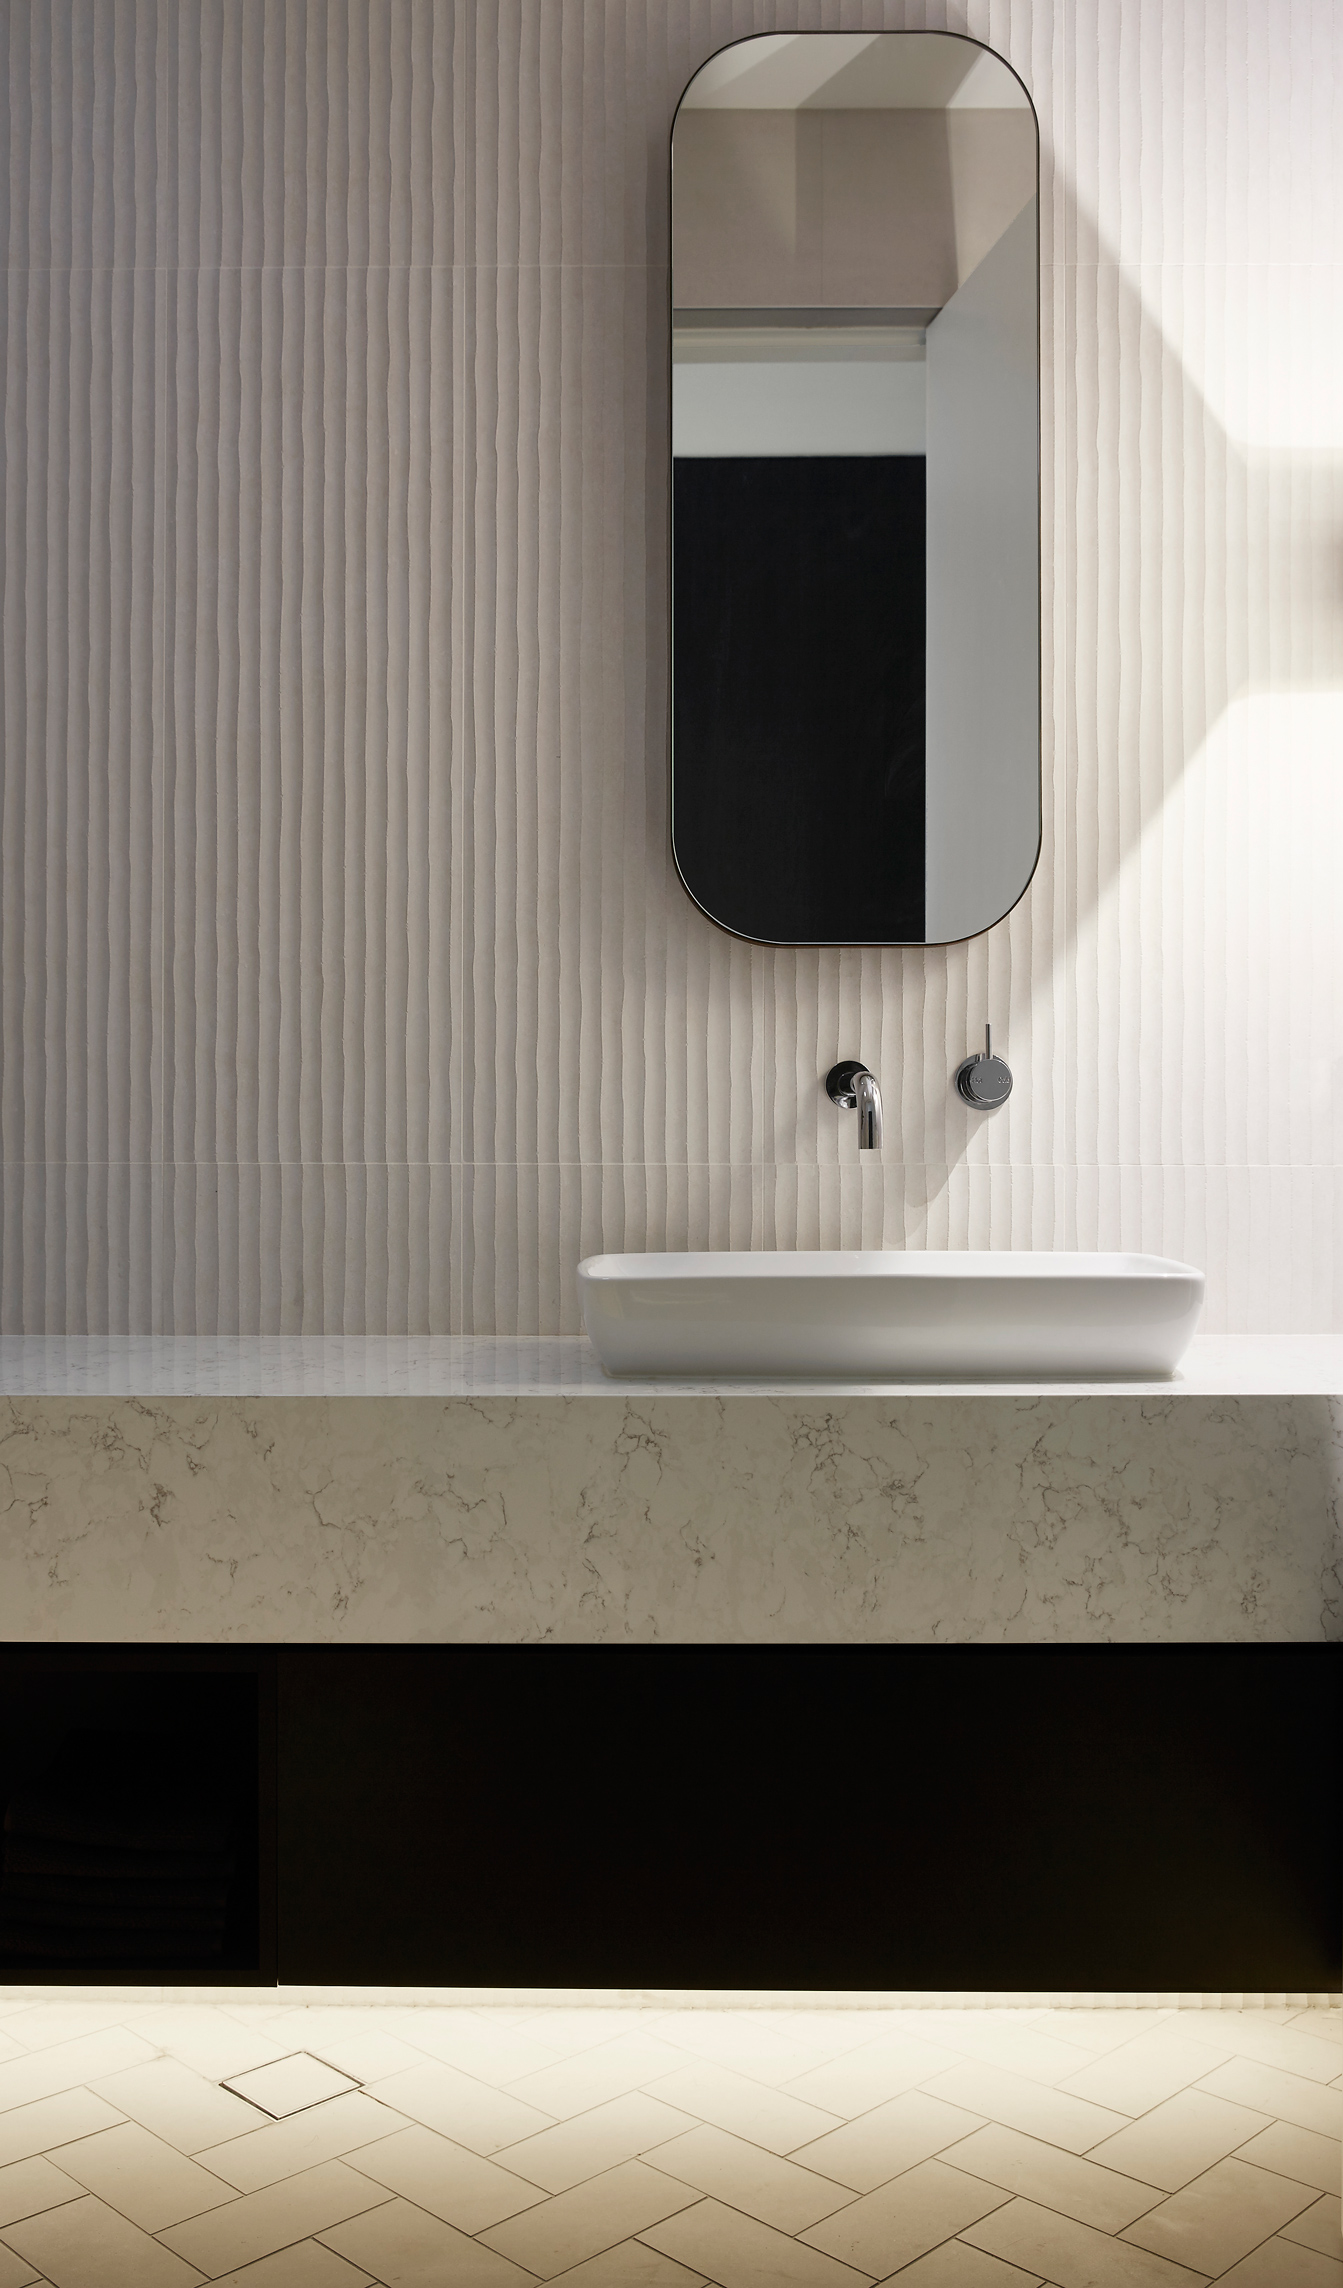 interiors photography_DesignBubbleStJamesRd_020.jpg